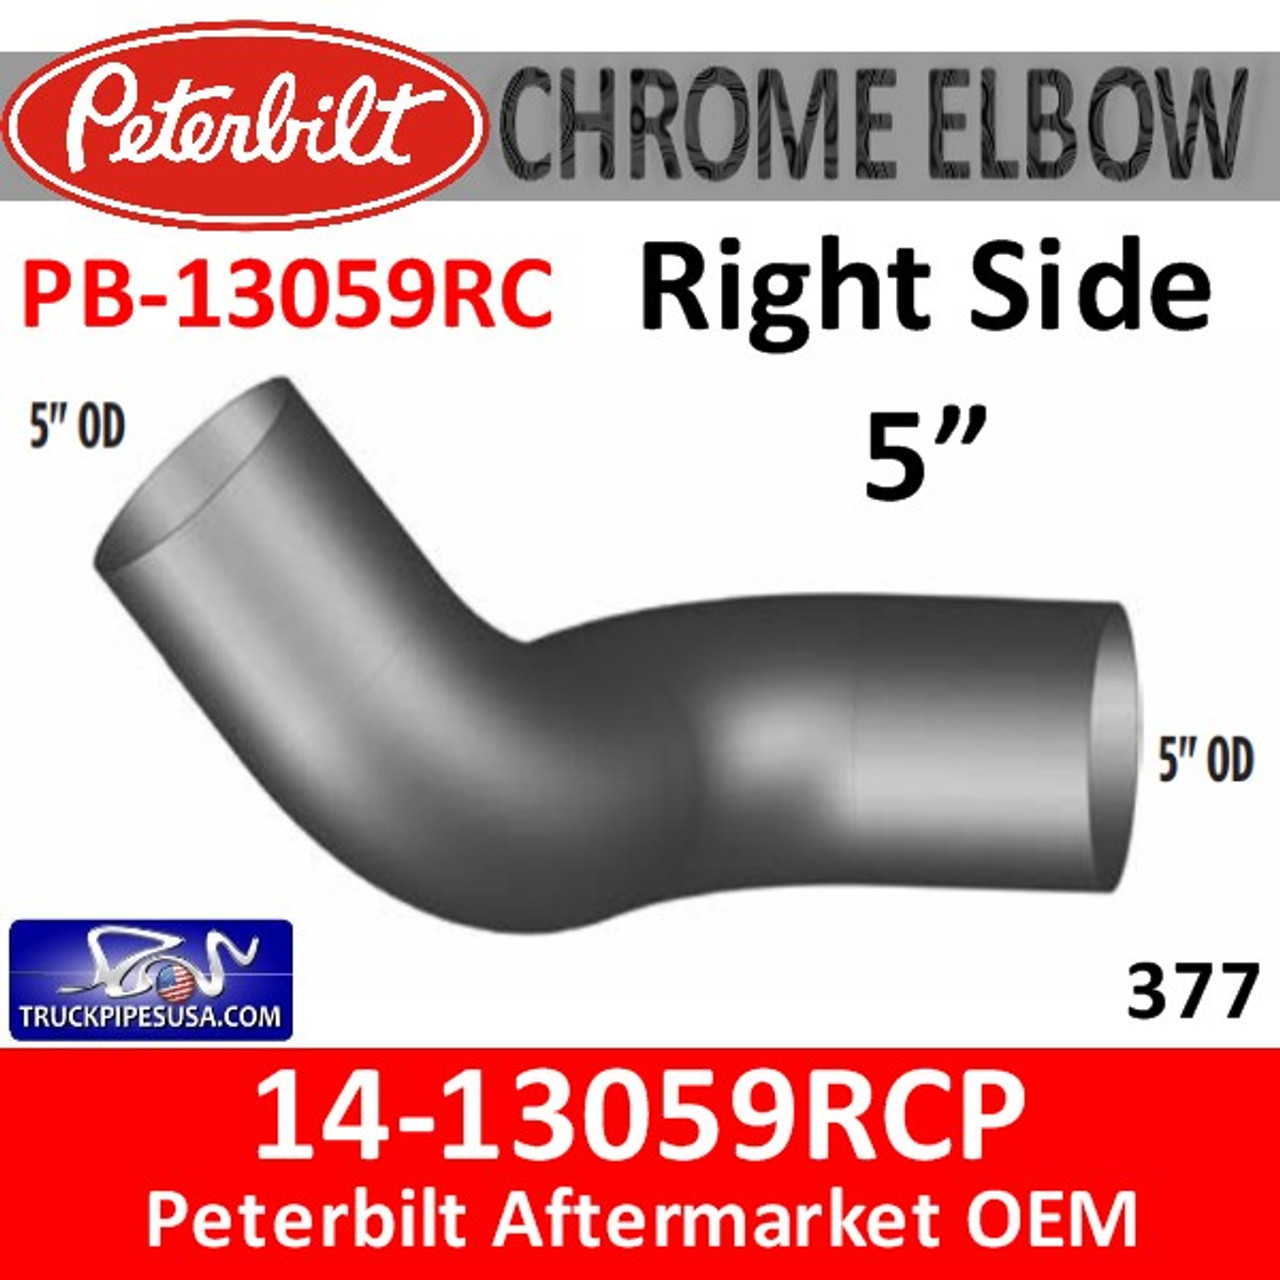 14-13059RCP Peterbilt 377 Right Chrome Exhaust Elbow PB-13059RC